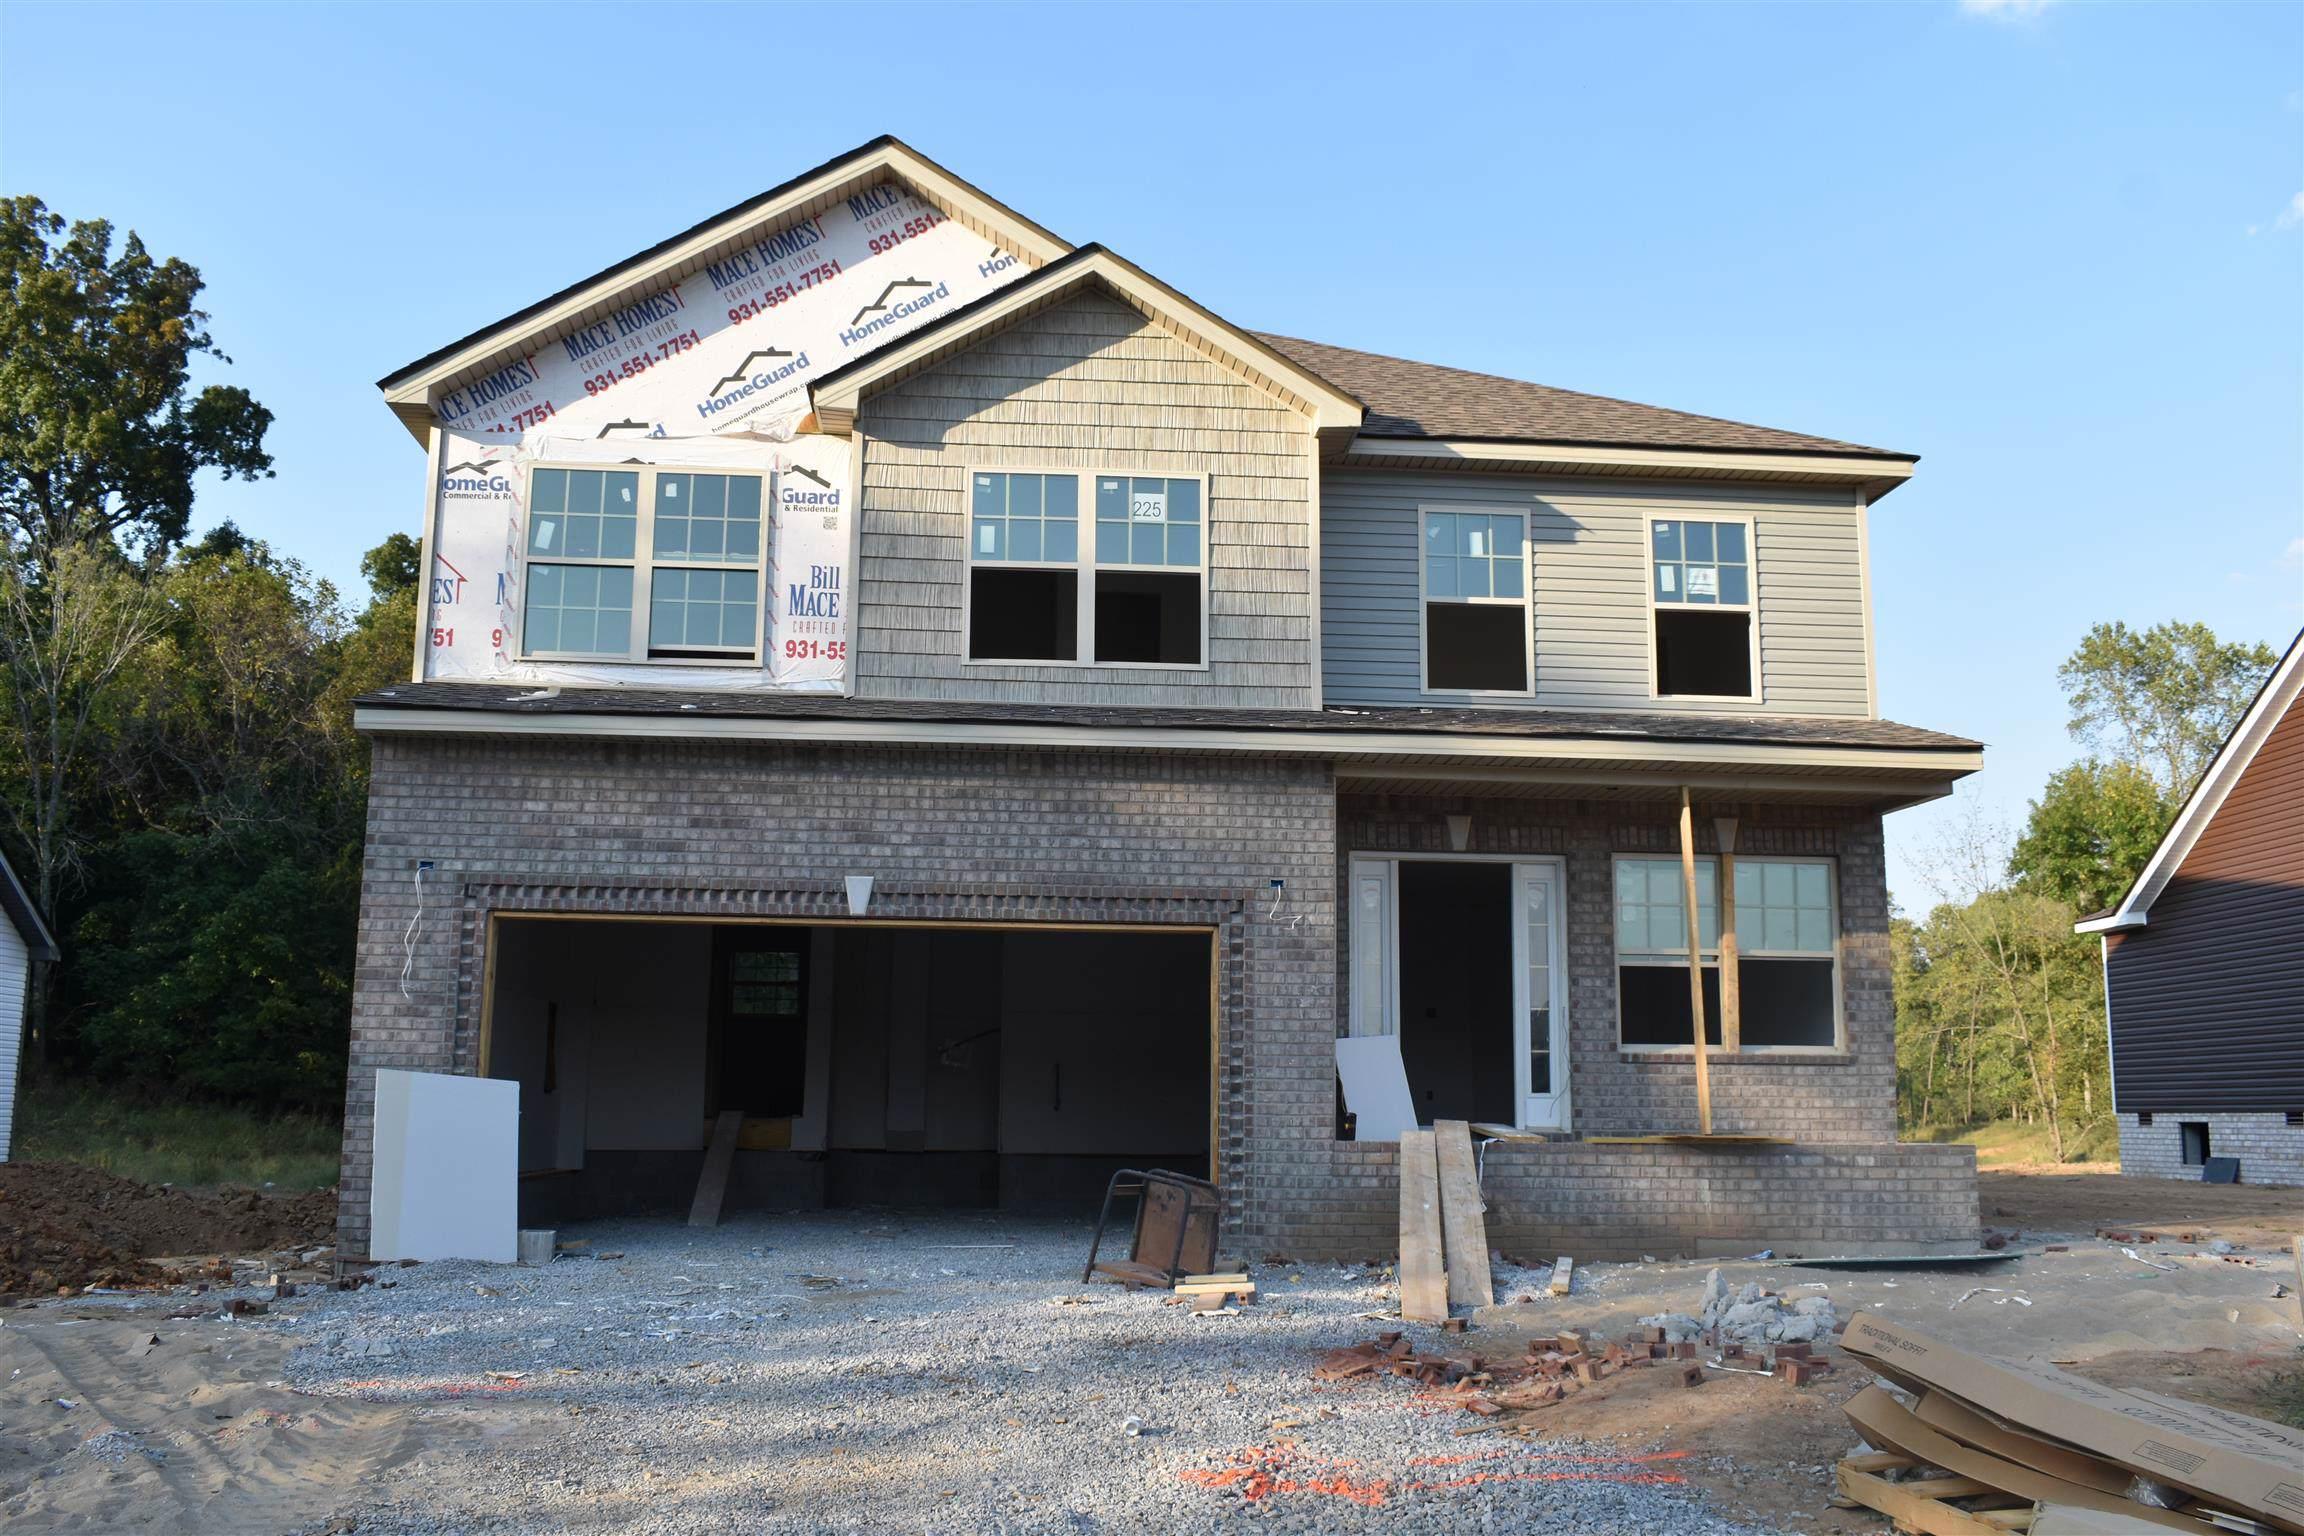 225 Timbersprings, Clarksville, TN 37042 (MLS #RTC2074518) :: Village Real Estate